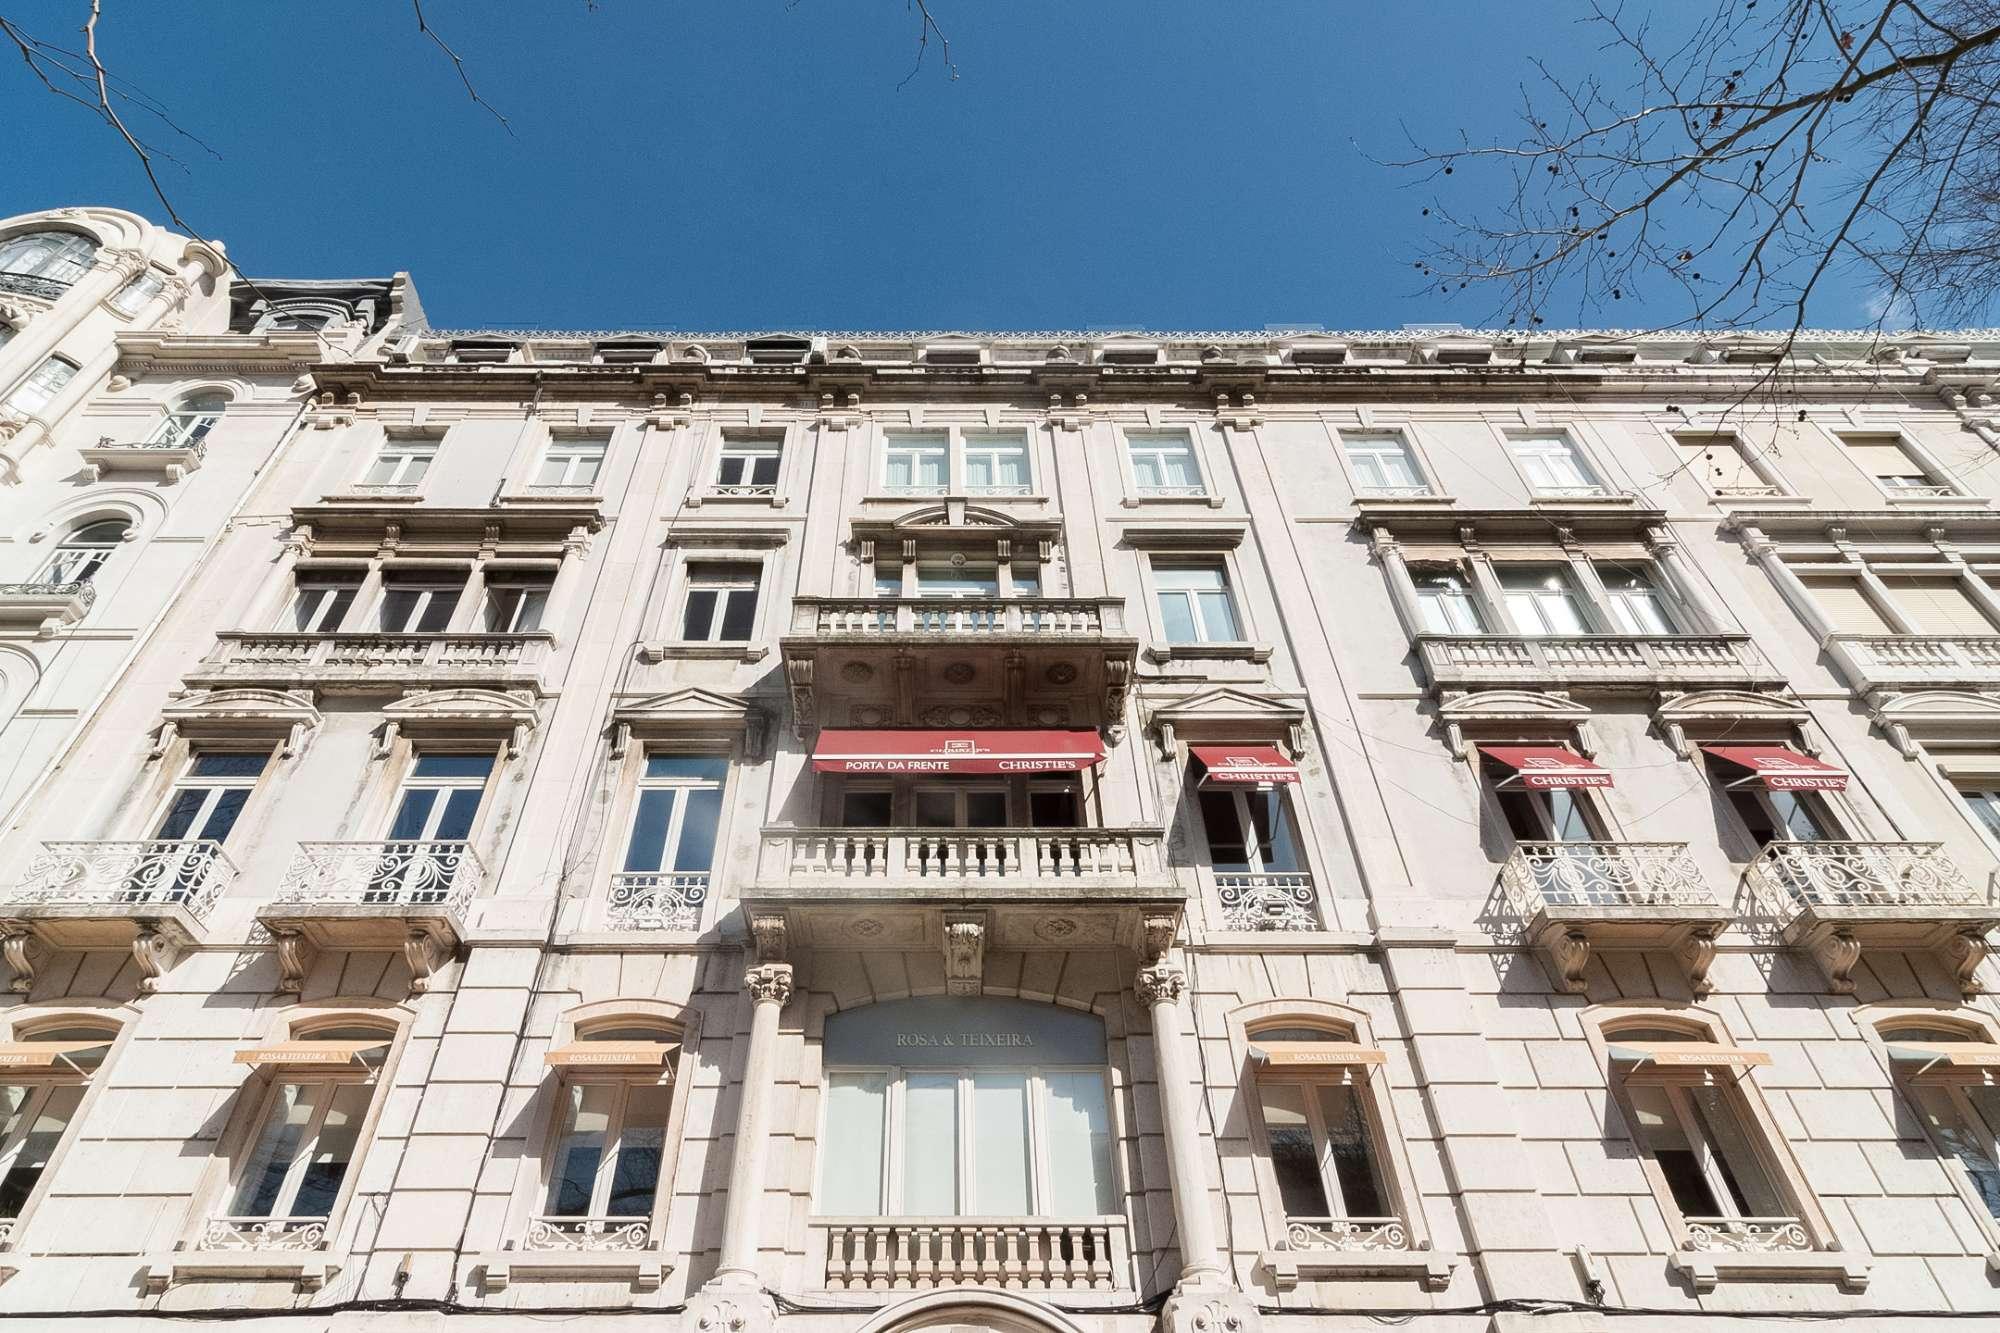 PF22376, Apartamento T2 + 1, Lisboa